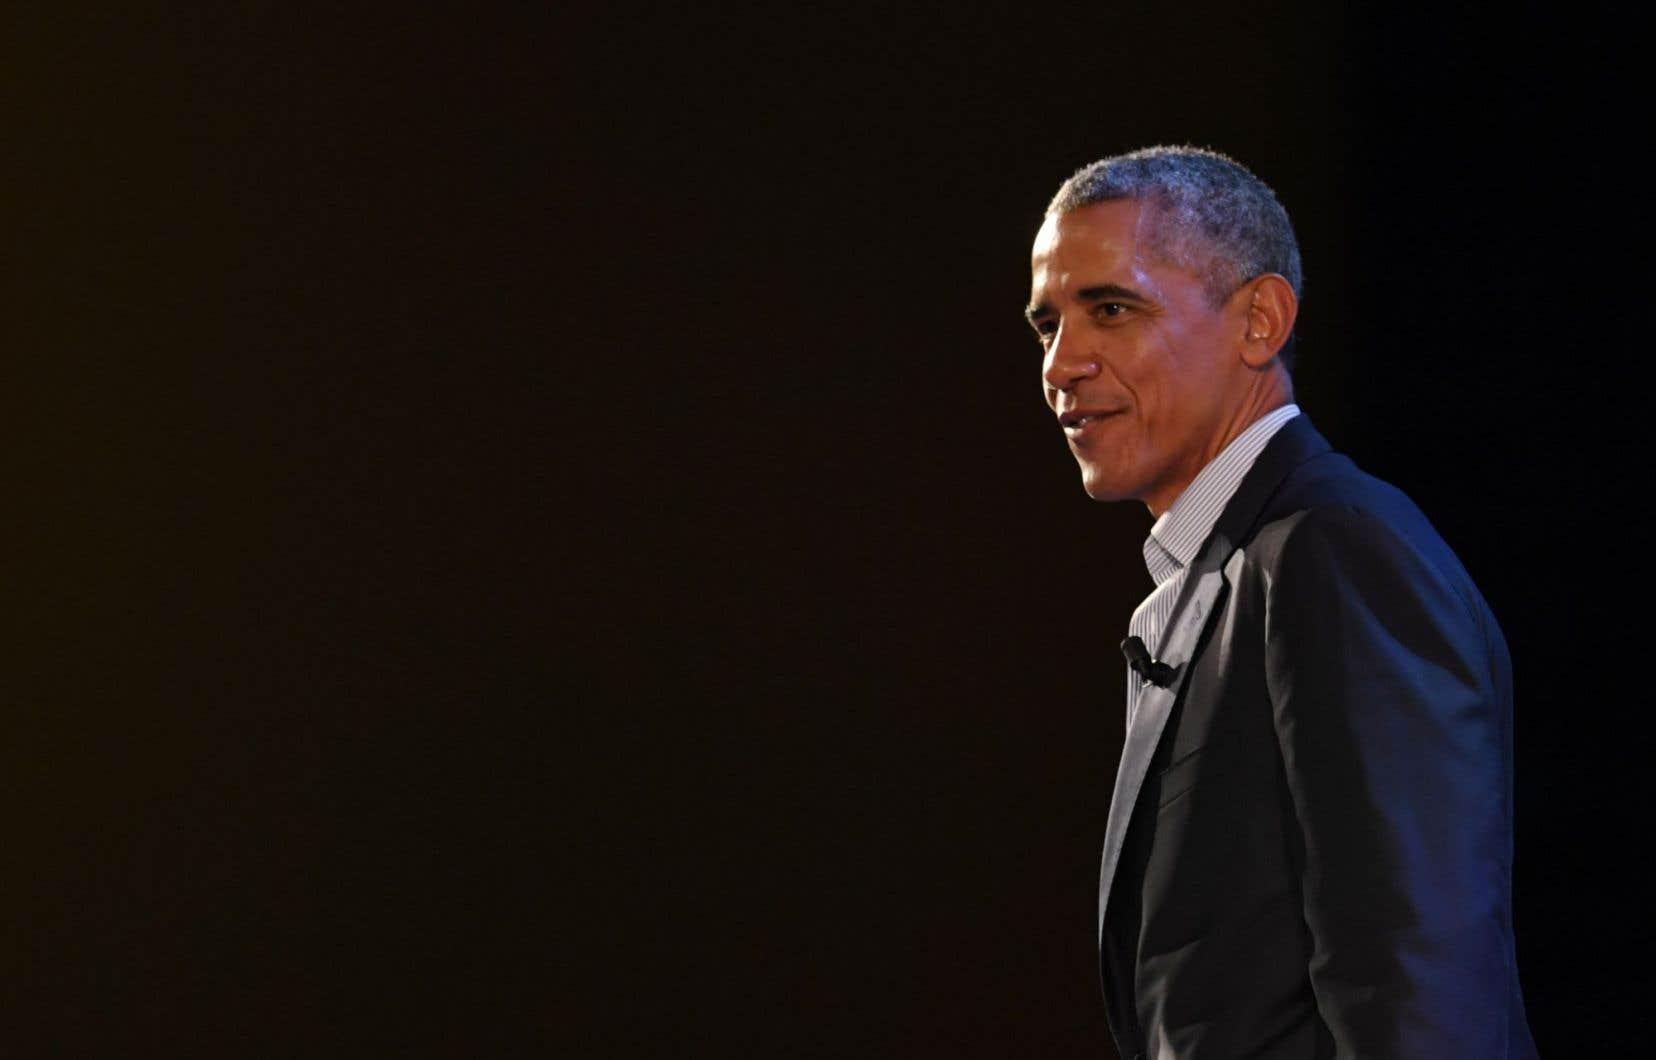 L'ancien président des États-UnisBarack Obama